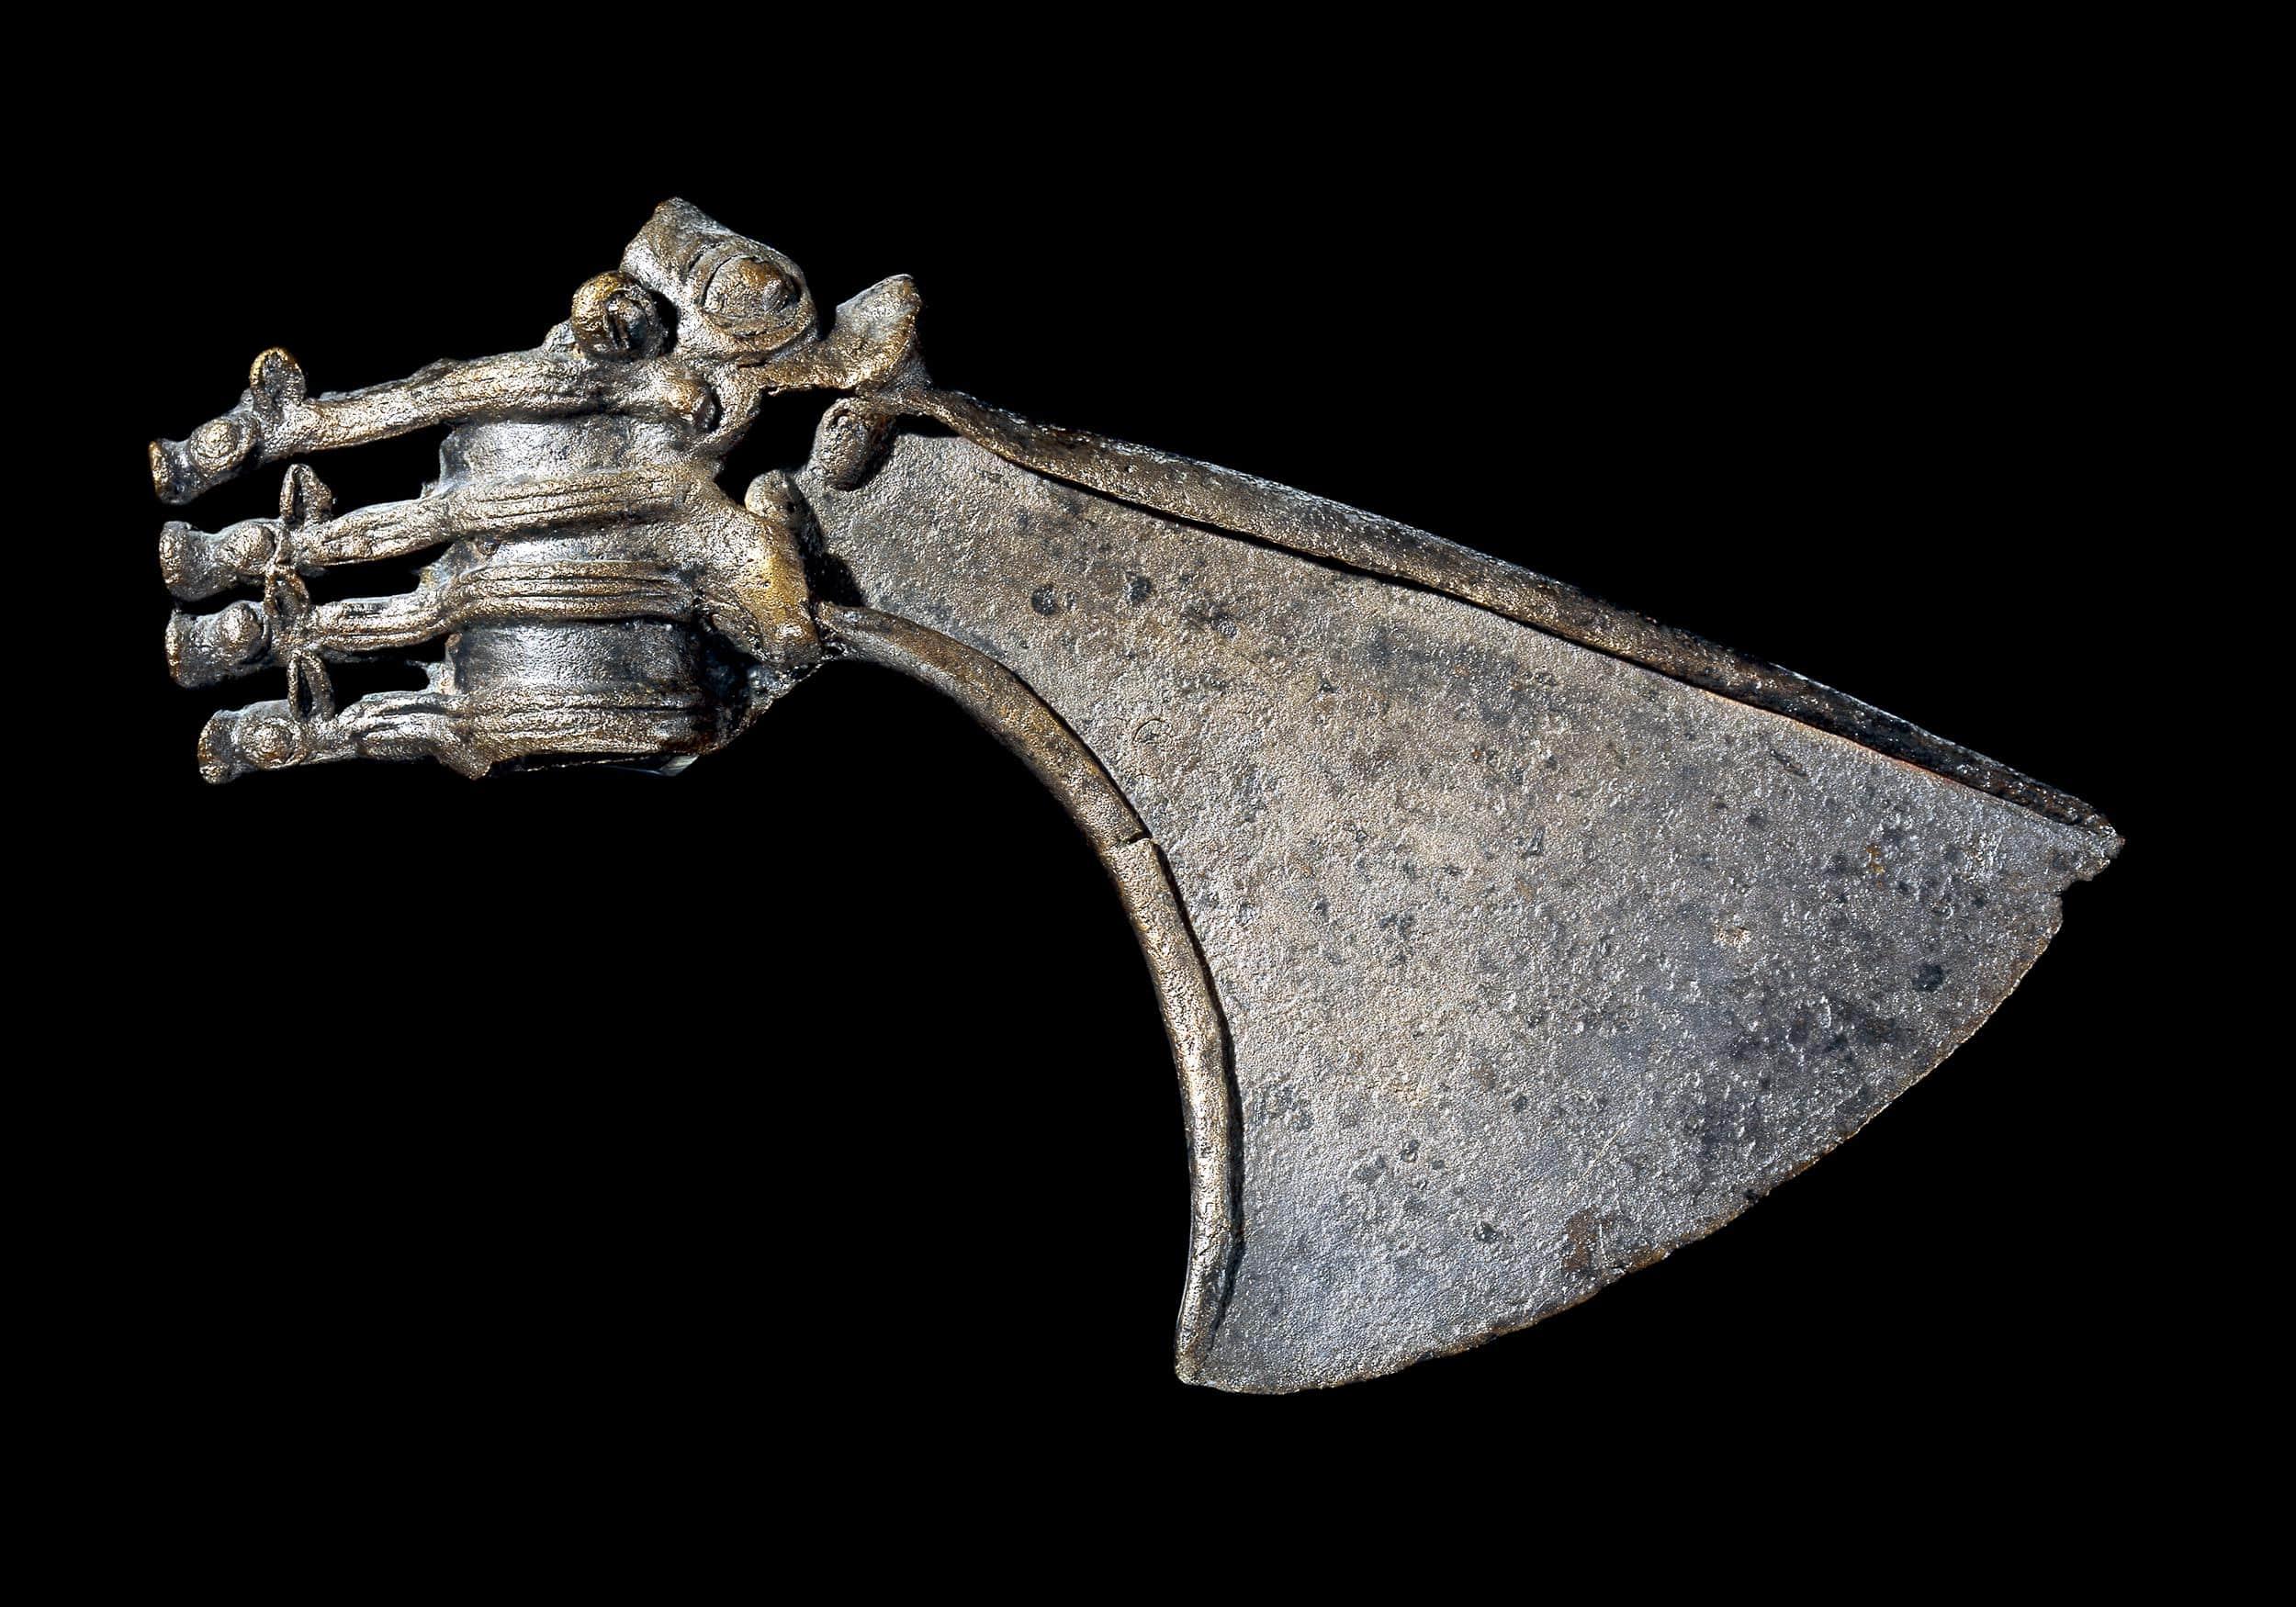 Koperen bijlkop (1000-500 v.Chr.) gevonden in Iran